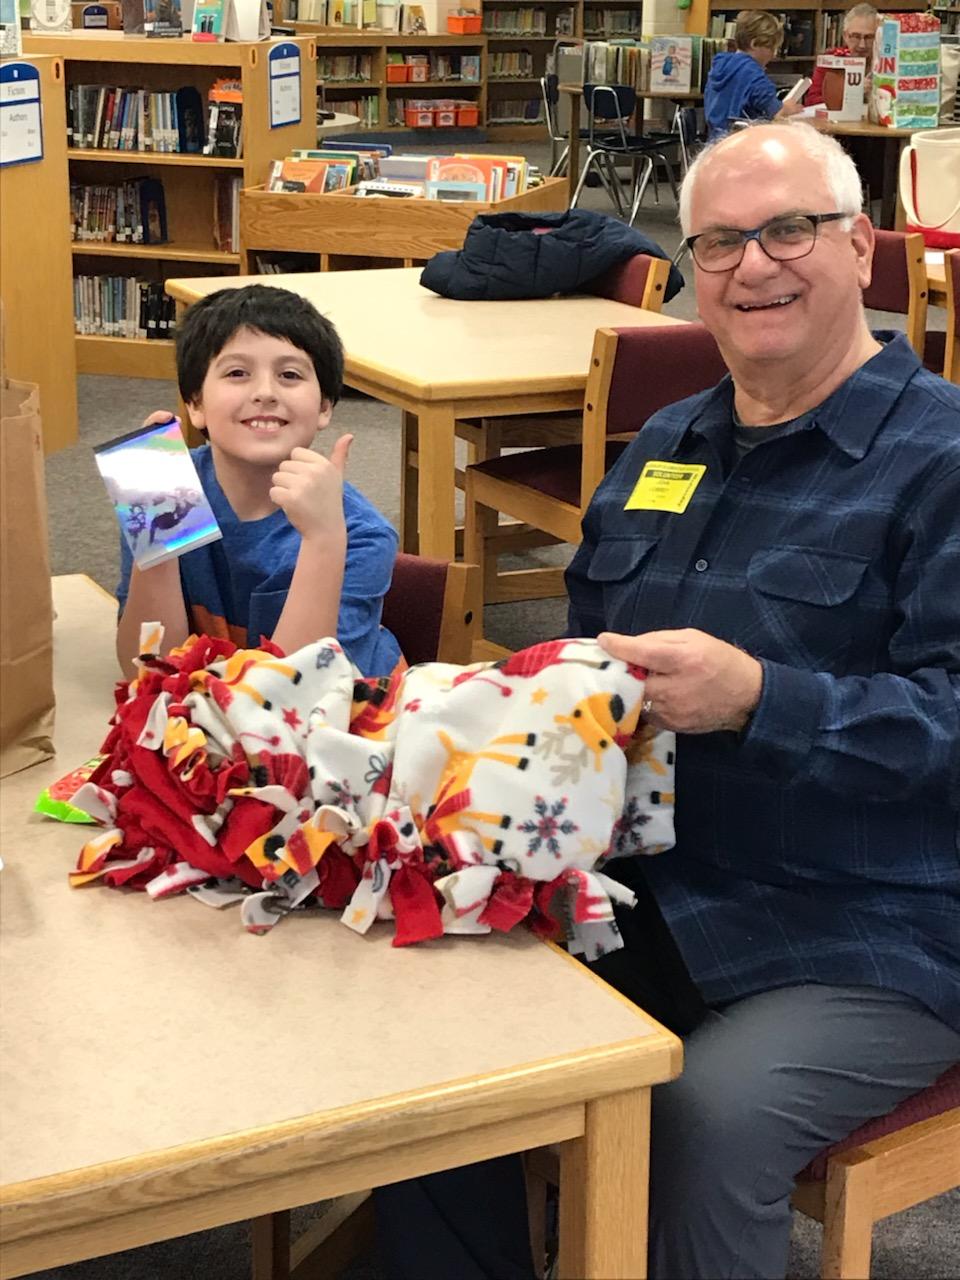 John Lowrey and his student Kid's Hope USA student, Kaden. John and Kaden just began meeting this school year.